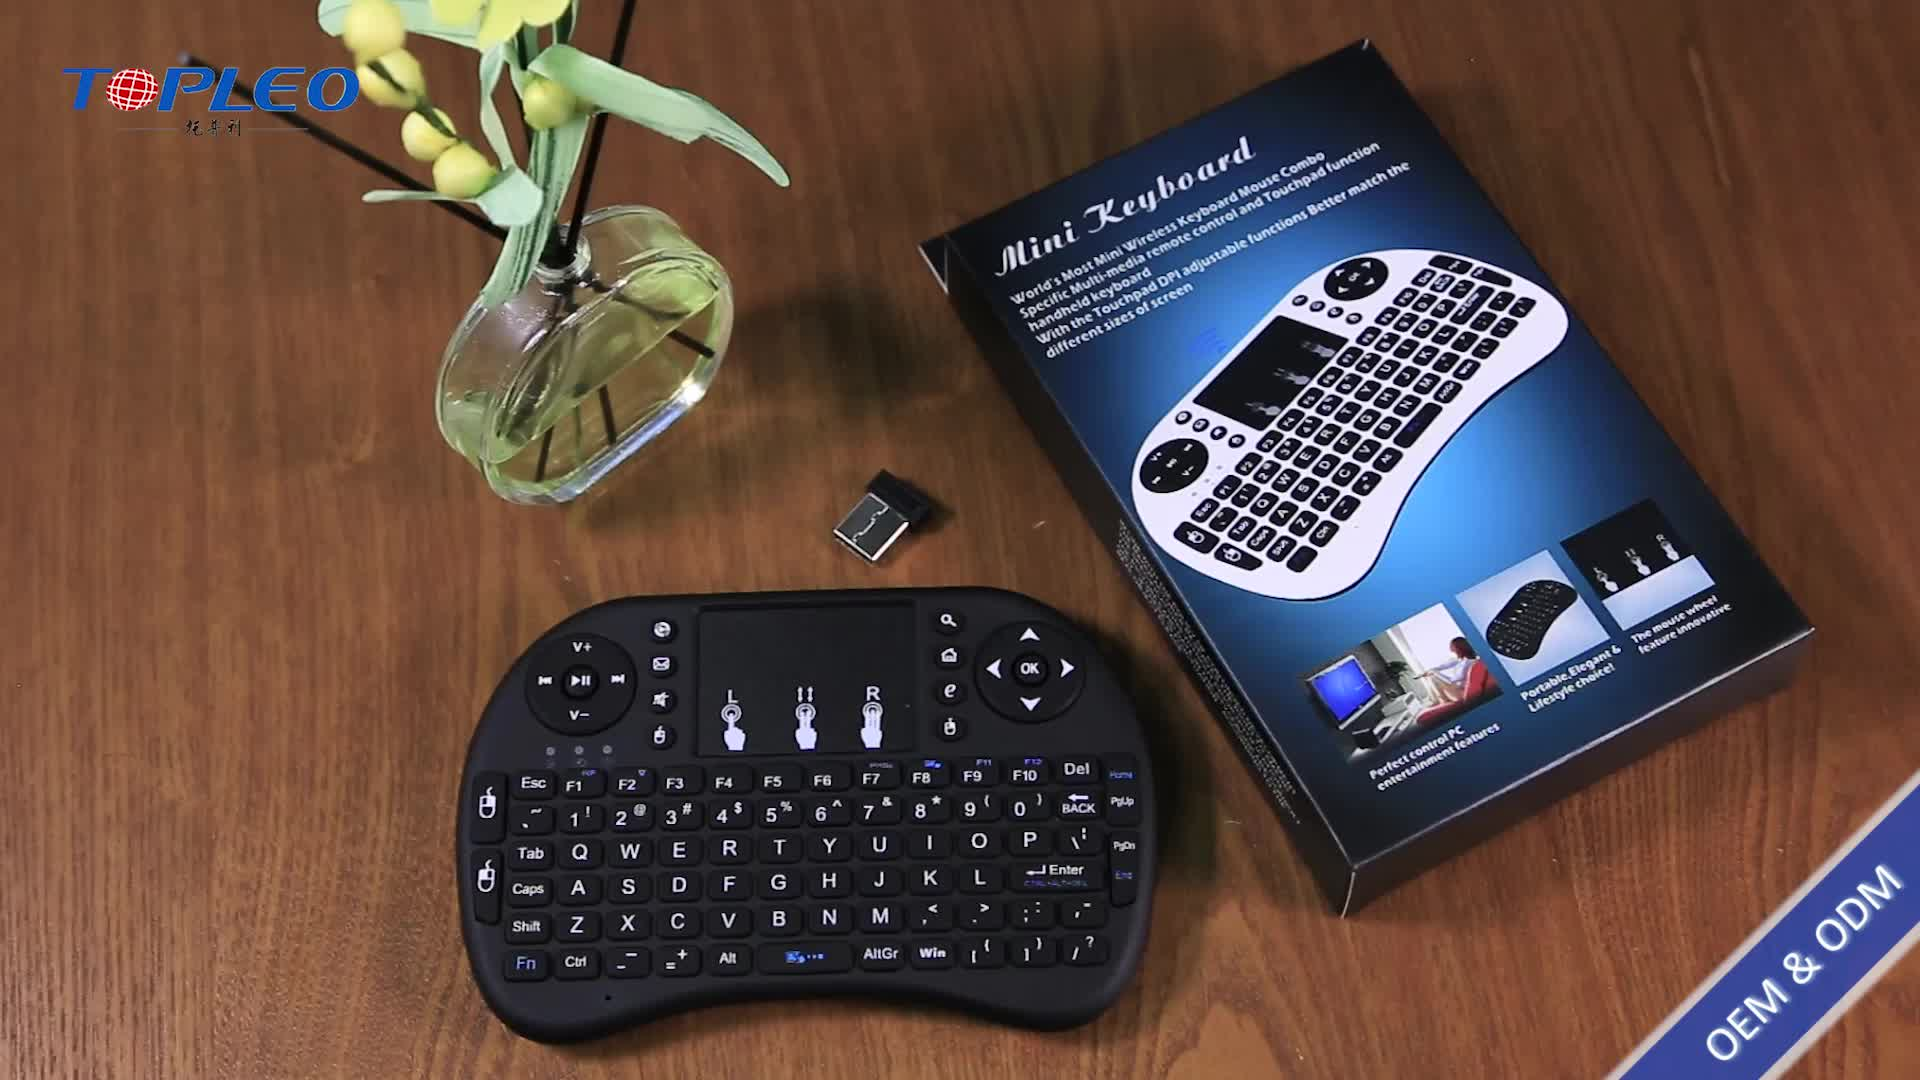 Mini teclado general para android tv box i8 teclado ratón con touchpad